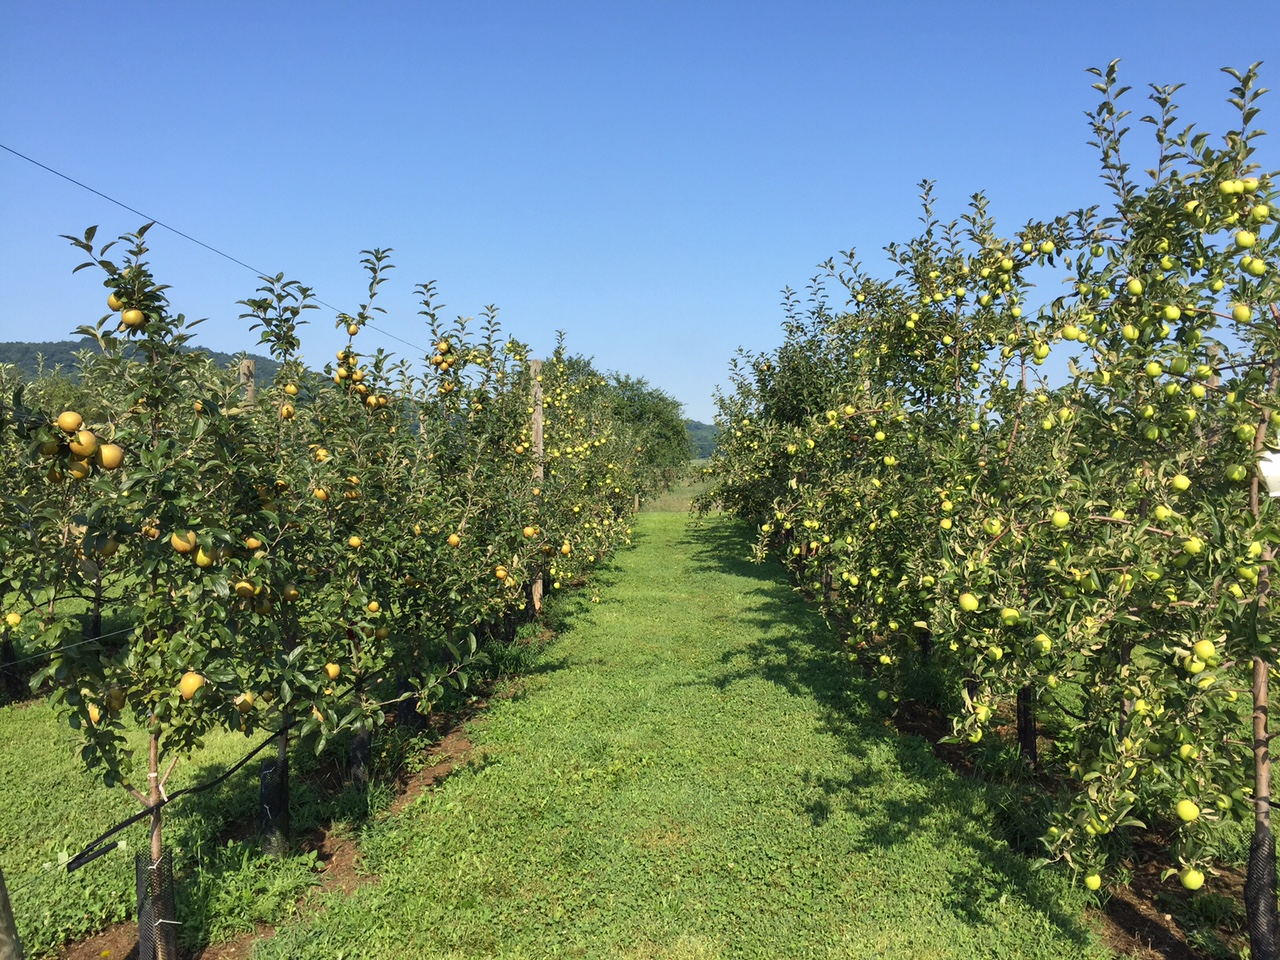 orchard pic 8:16.JPG